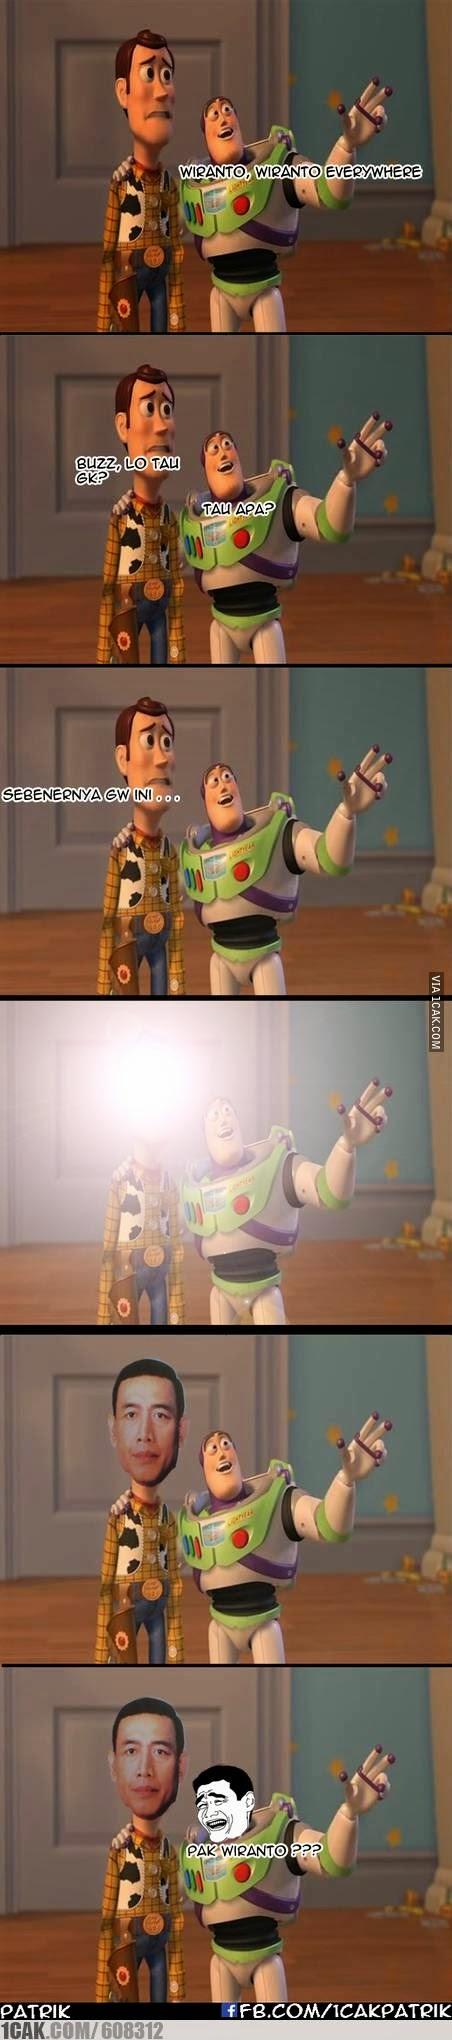 Meme Lucu Wiranto Menyamar 8